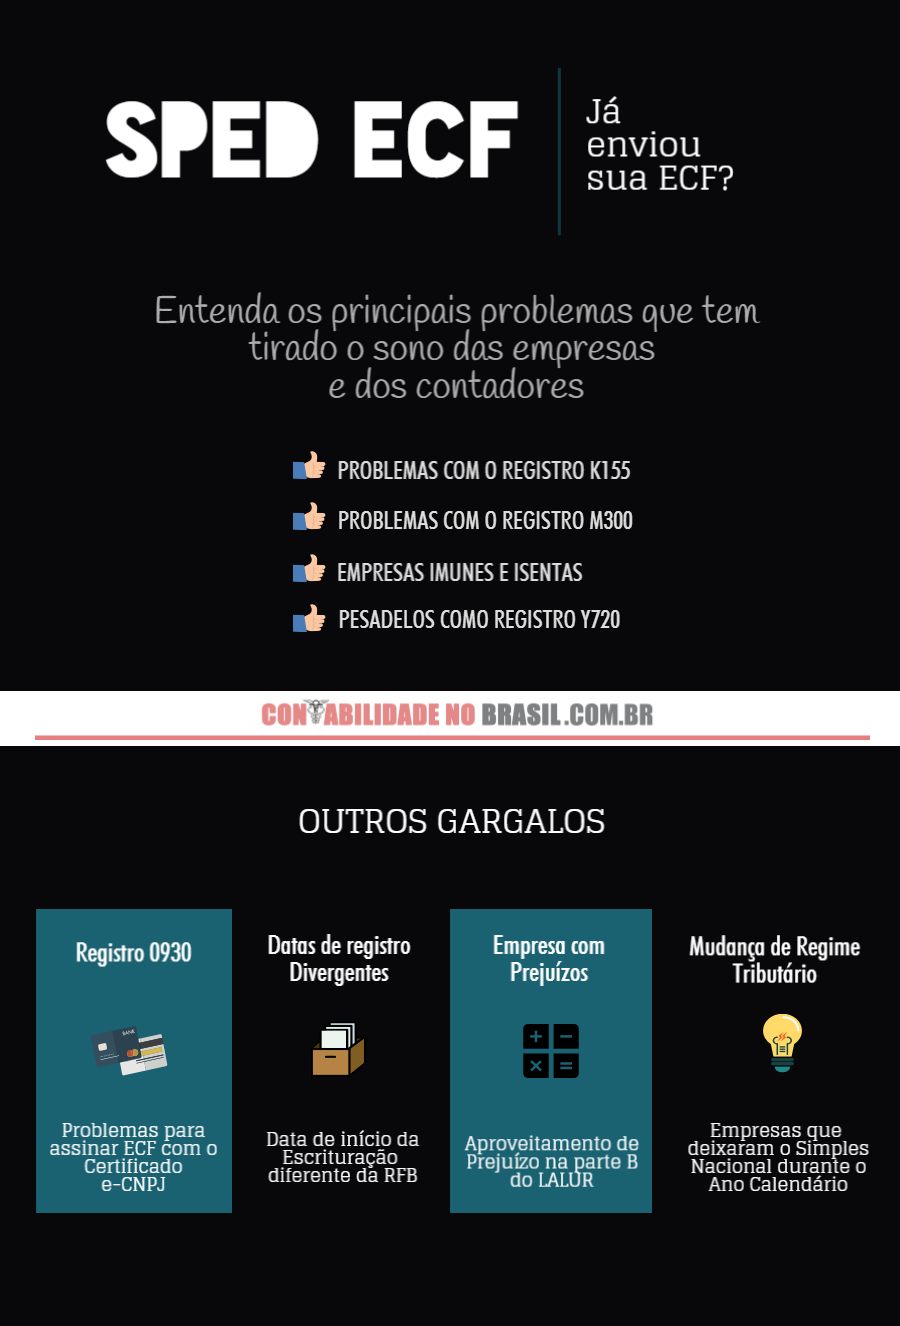 SPED ECF infografico